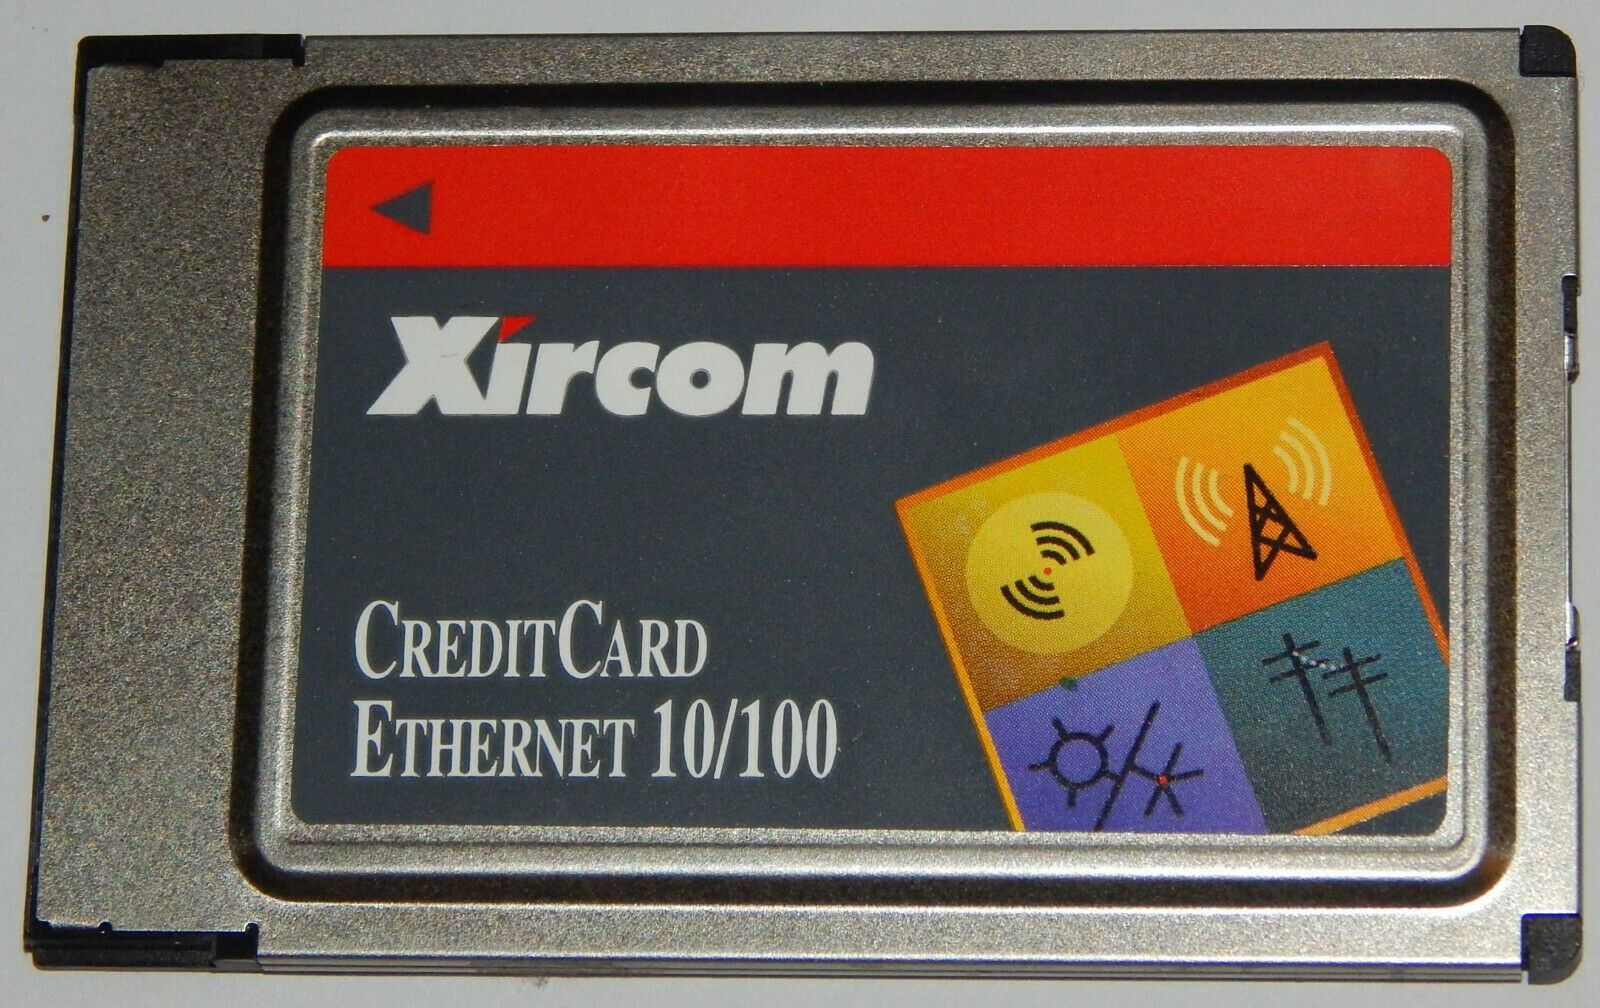 Xircom CreditCard Ethernet 10/100 16-Bit PCMCIA Netzwerk Karte